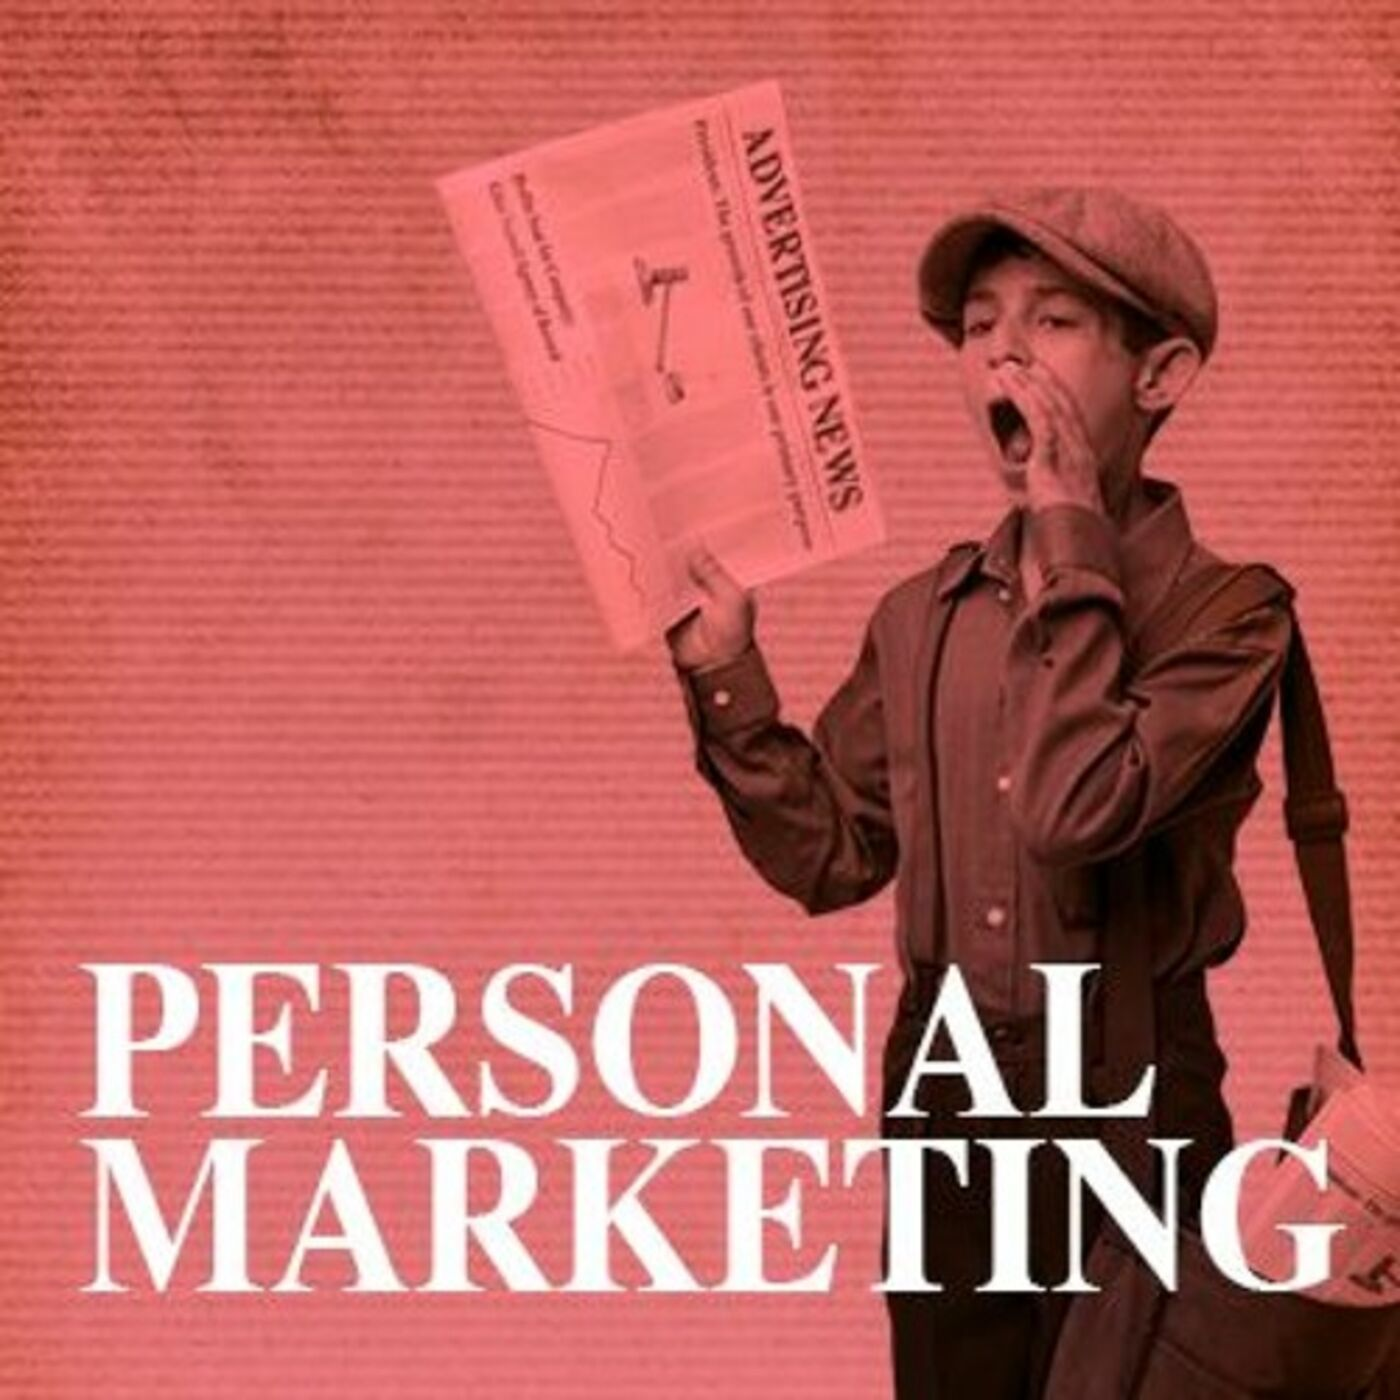 Personalized Marketing - The Glint Standard